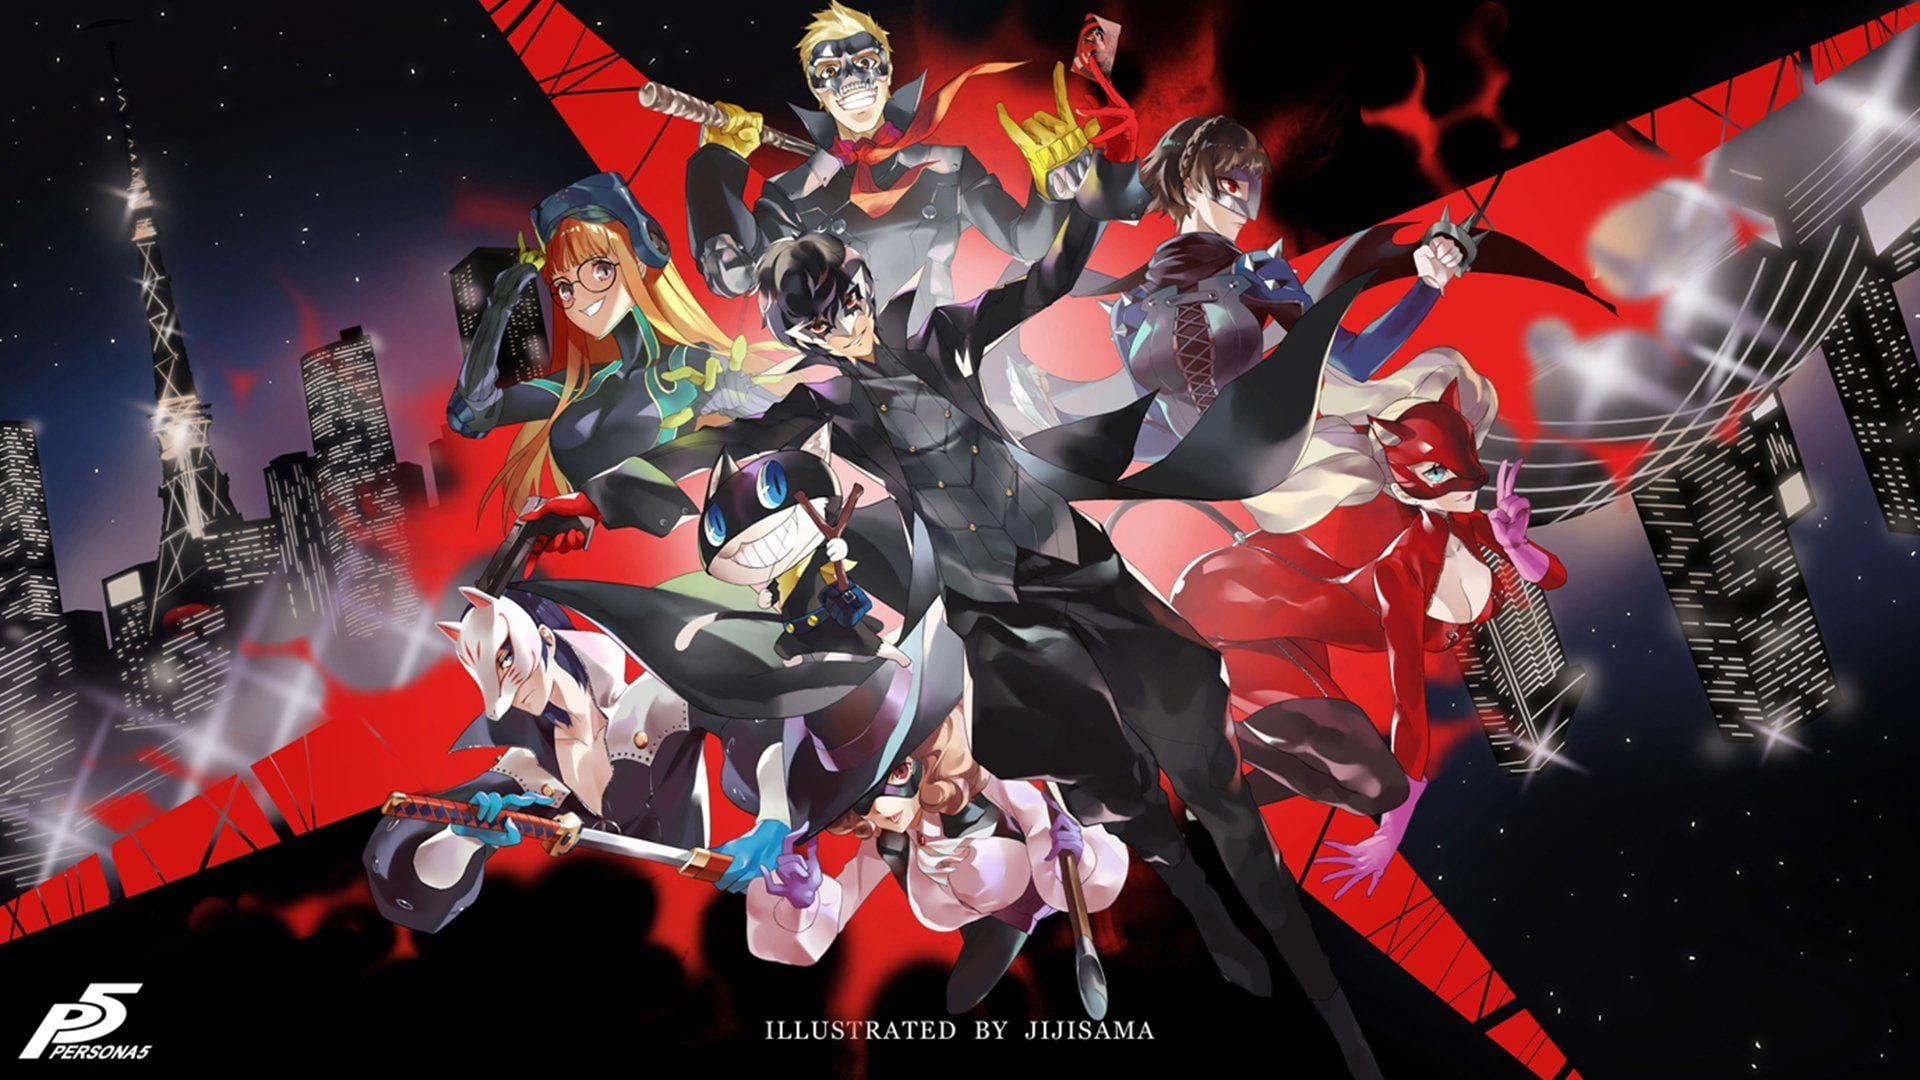 Persona Persona 5 Anime Ann Takamaki Futaba Sakura Haru Okumura Joker Persona Makoto Niijima Morgana Persona Ryuji Sakamoto Video Anime Persona 5 Persona